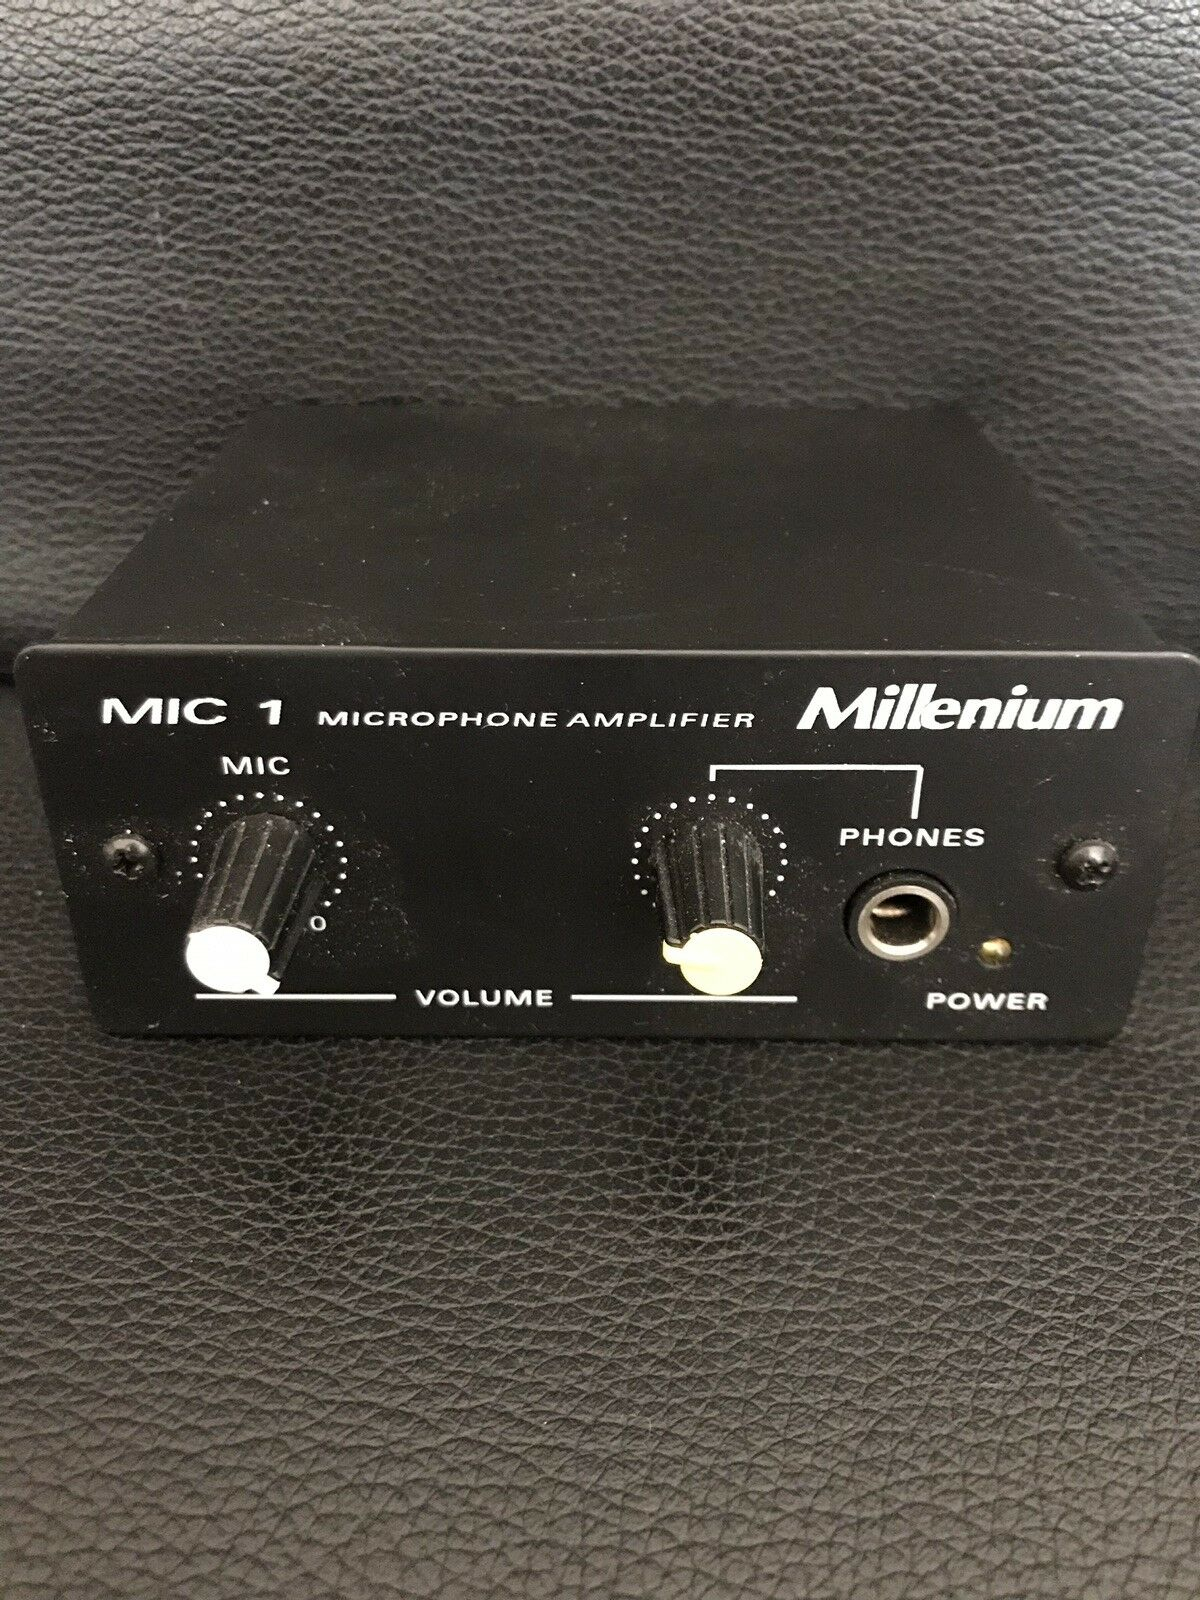 Millenium Mic 1 Microphone Amplifier